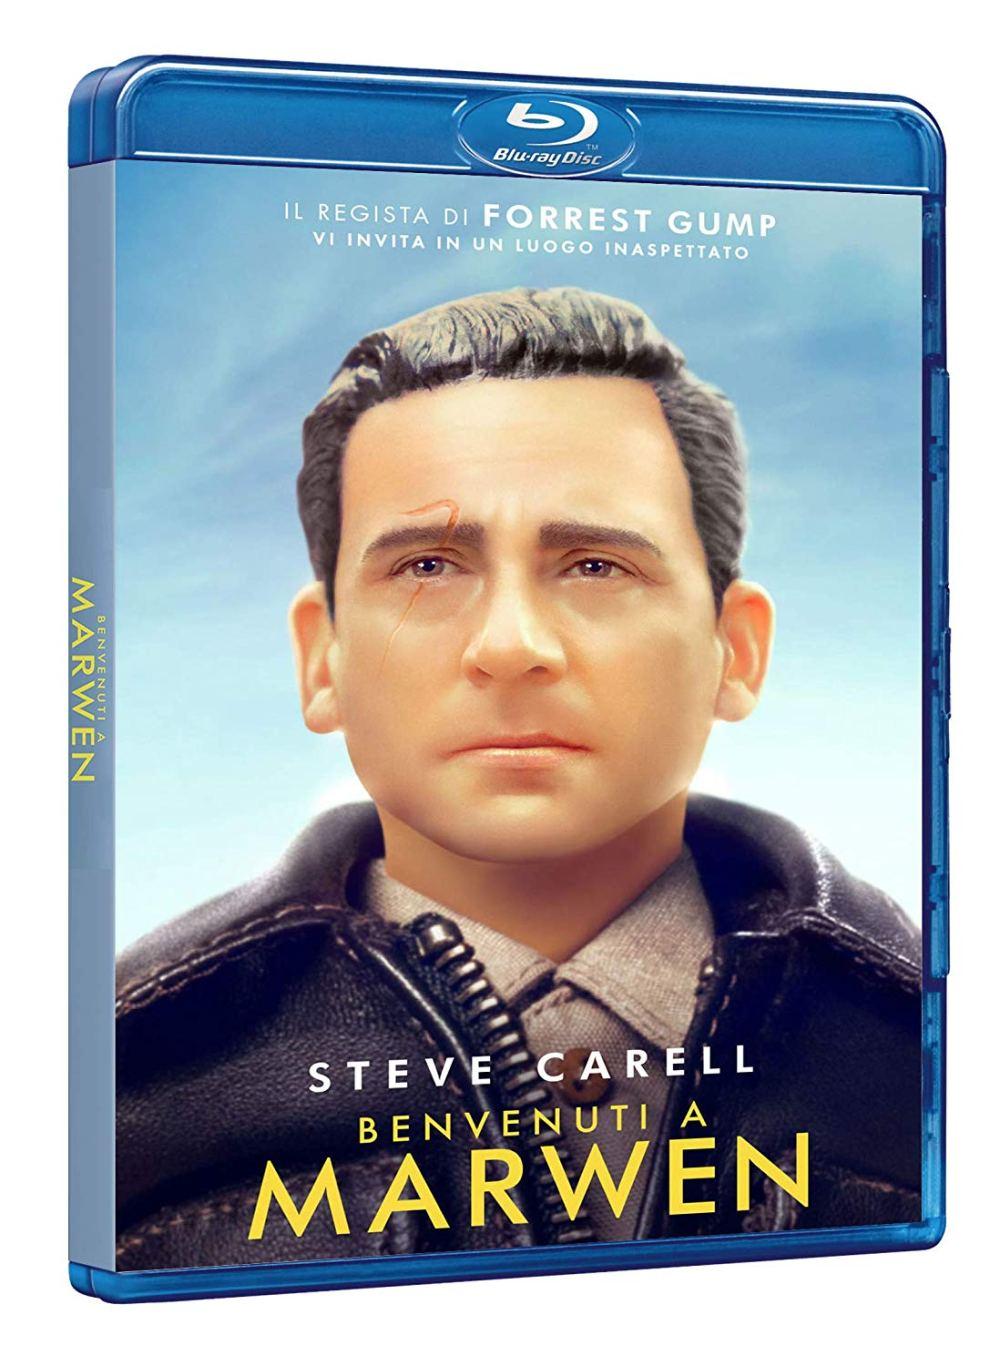 benvenuti a marwen blu ray dvd recensione_